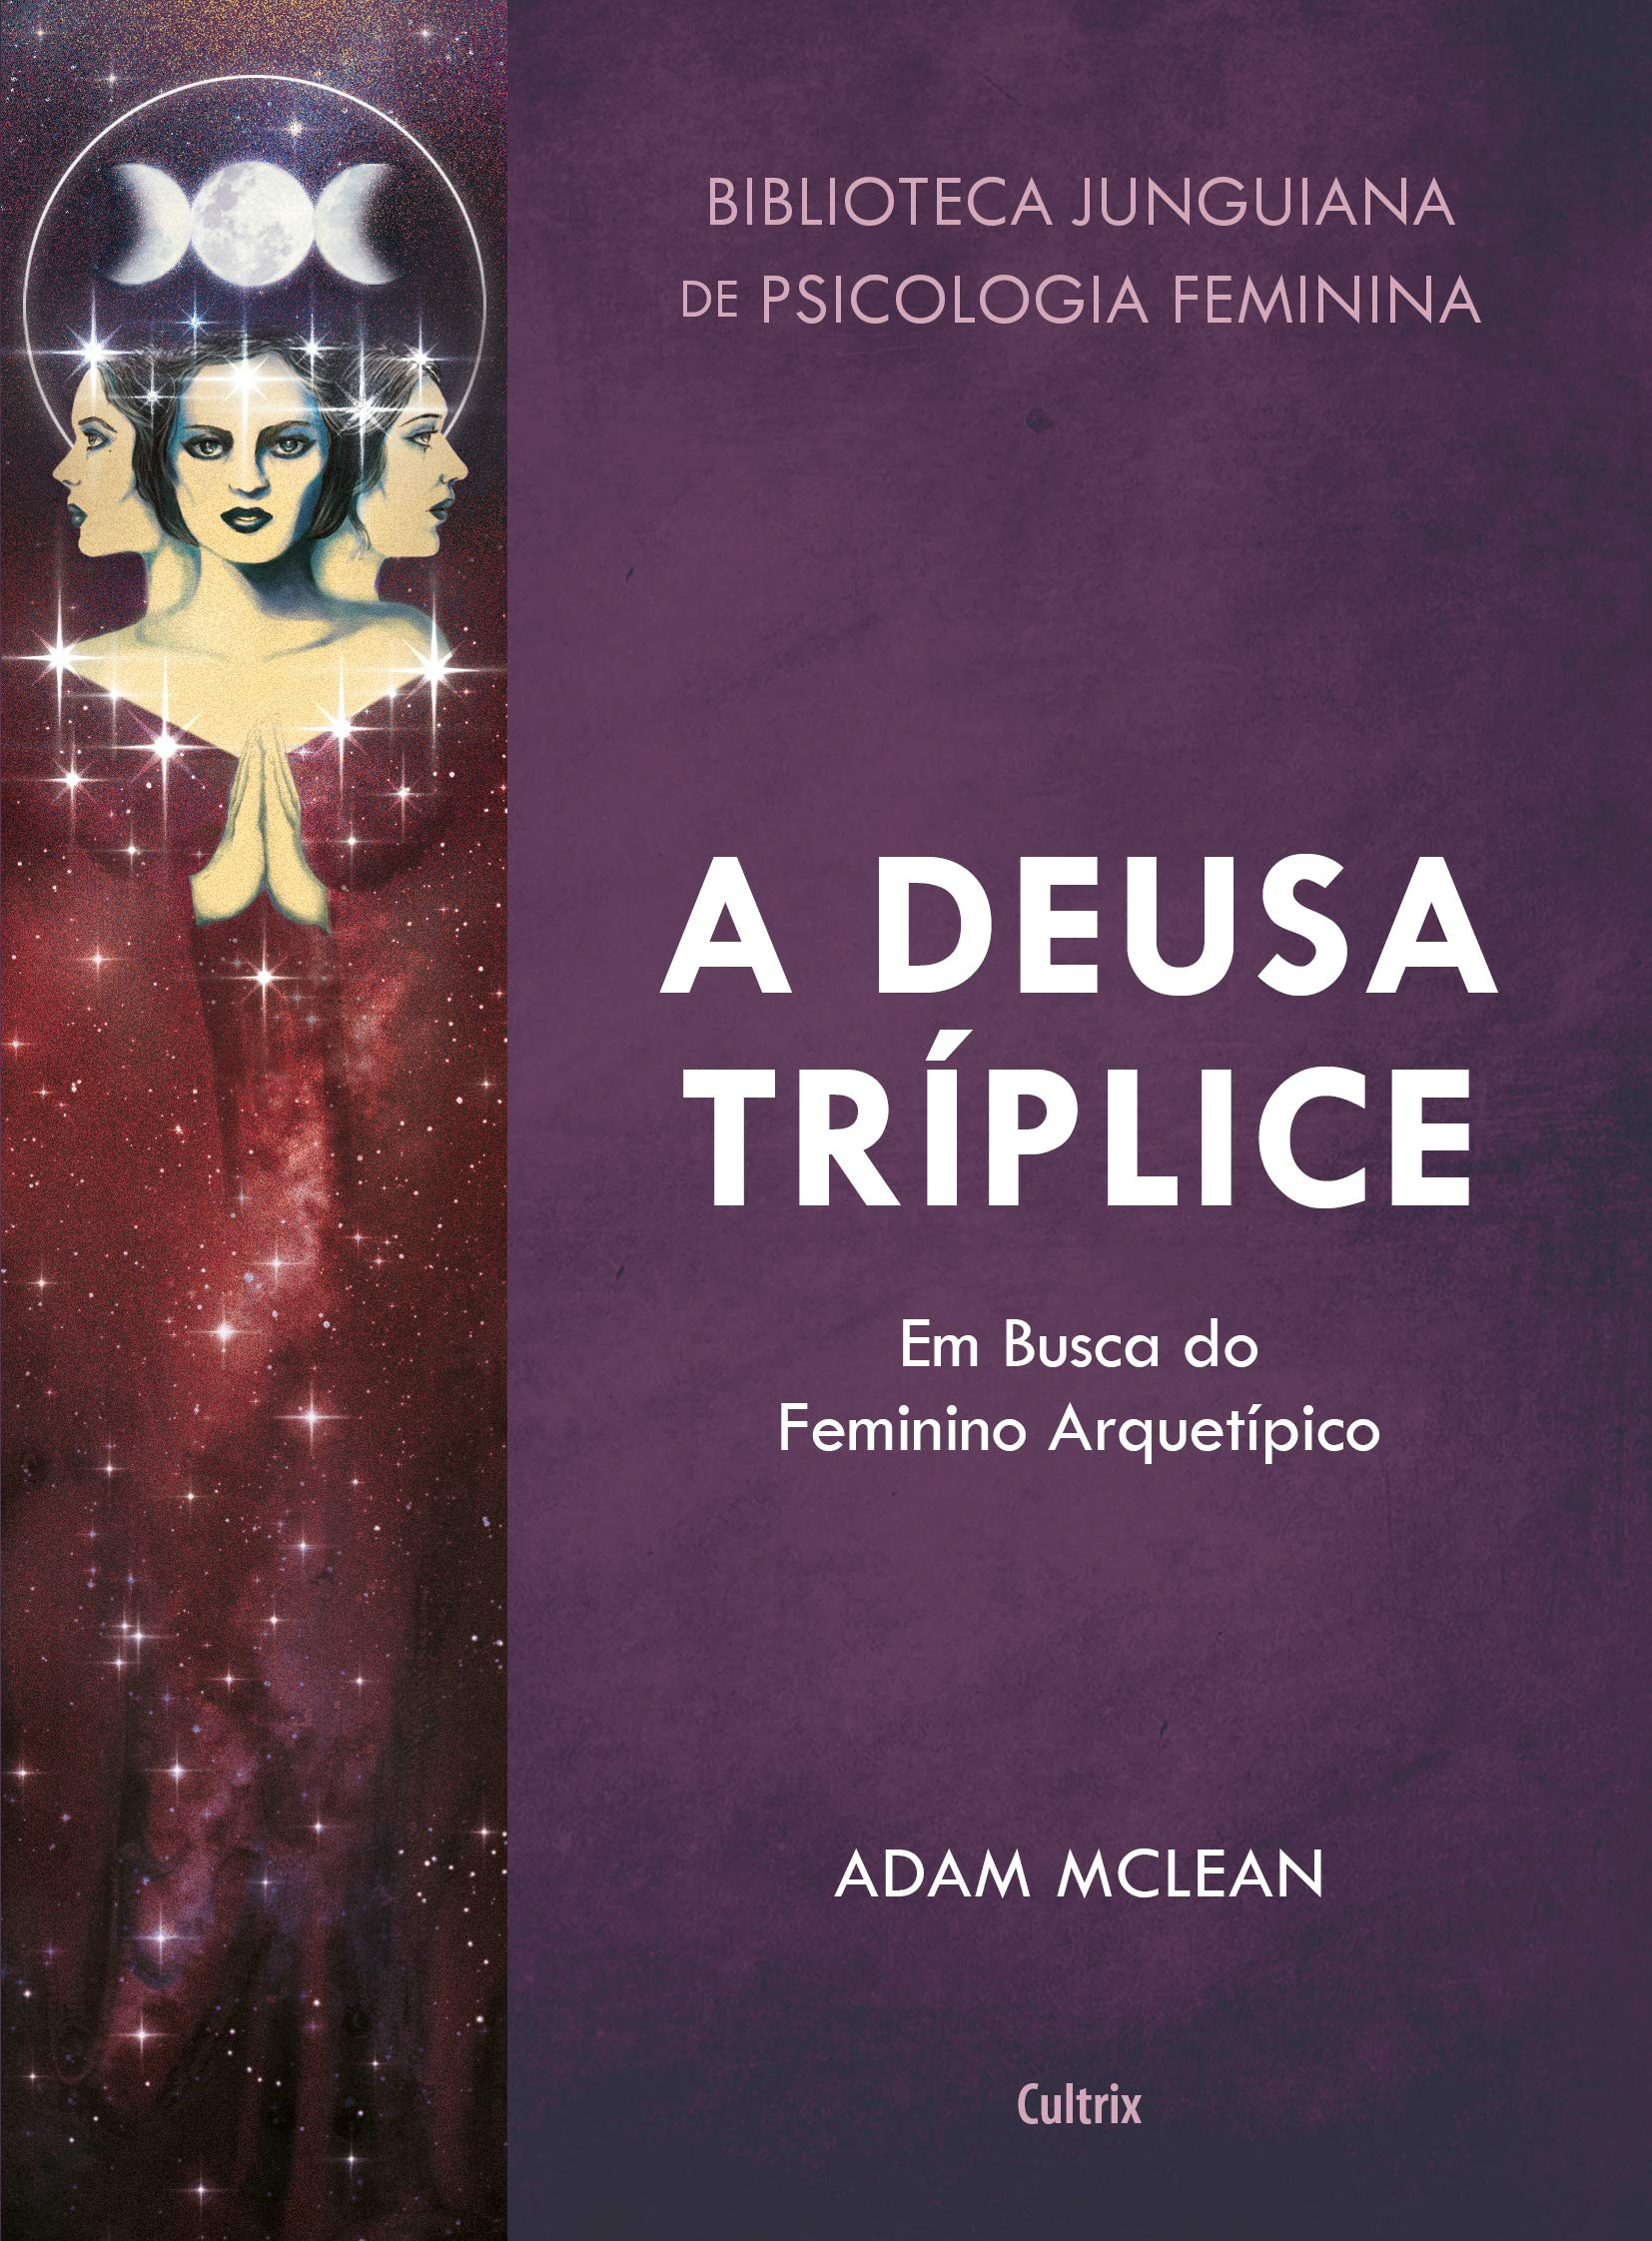 Livro 'A Deusa Tríplice' de Adam McLean